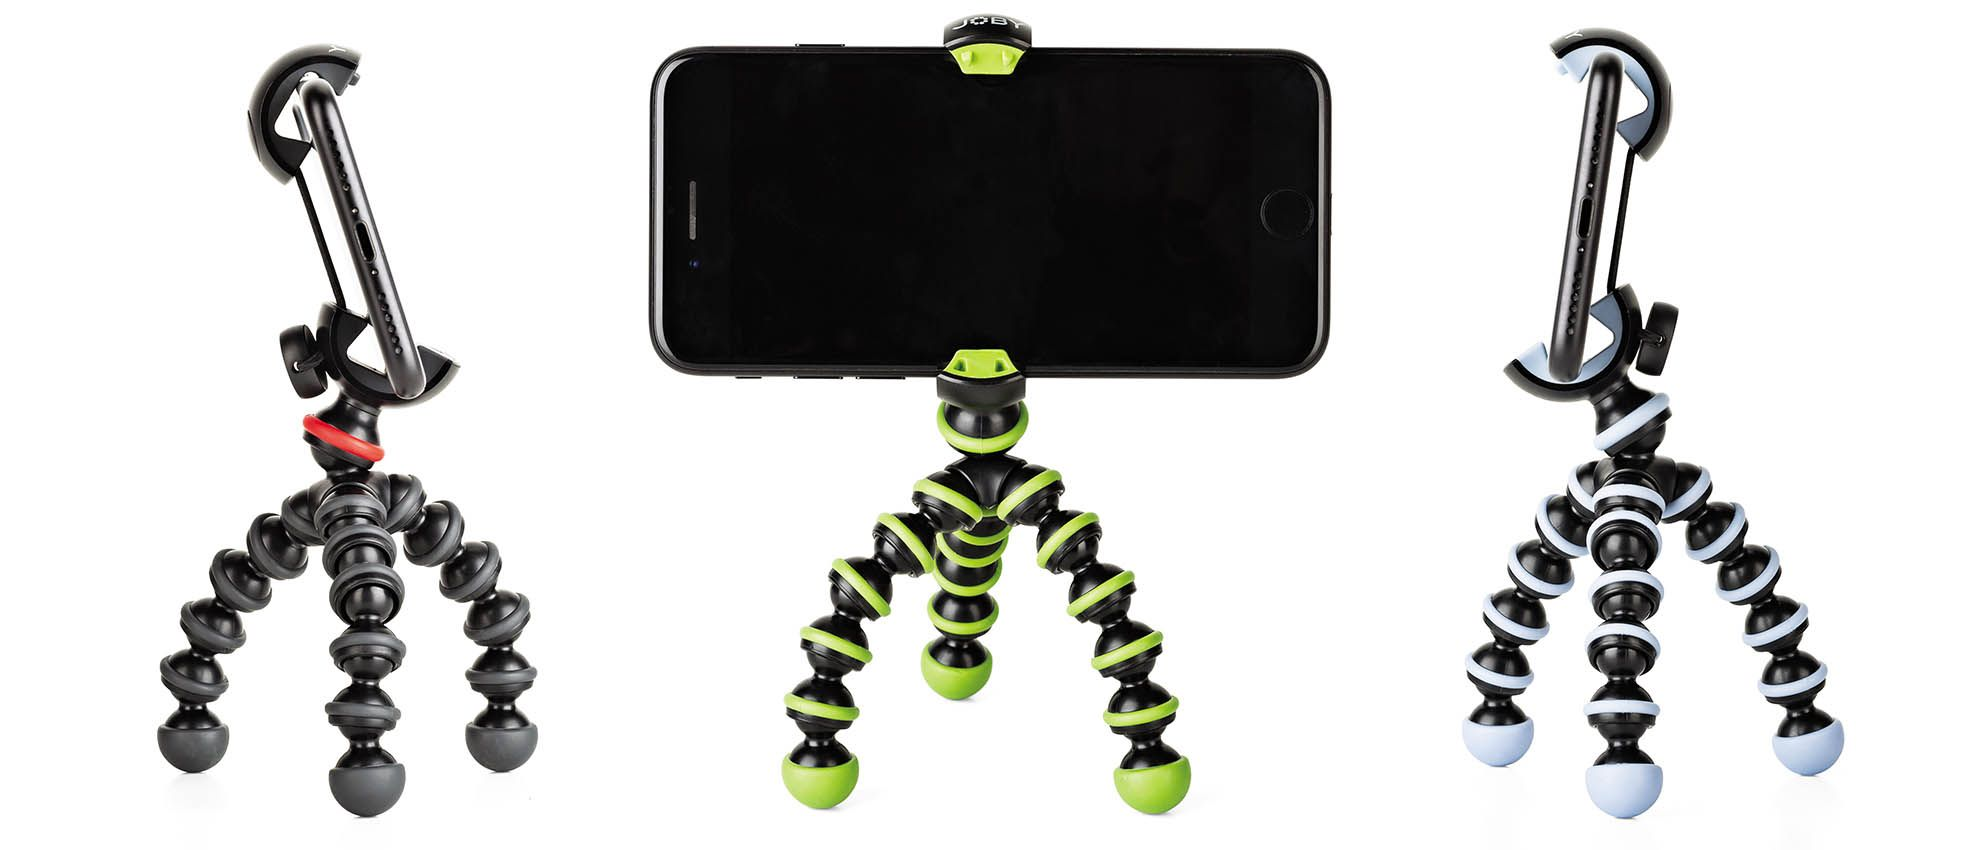 JOBY G MOBILE MINI - JOBY GorillaPod Mobile Mini